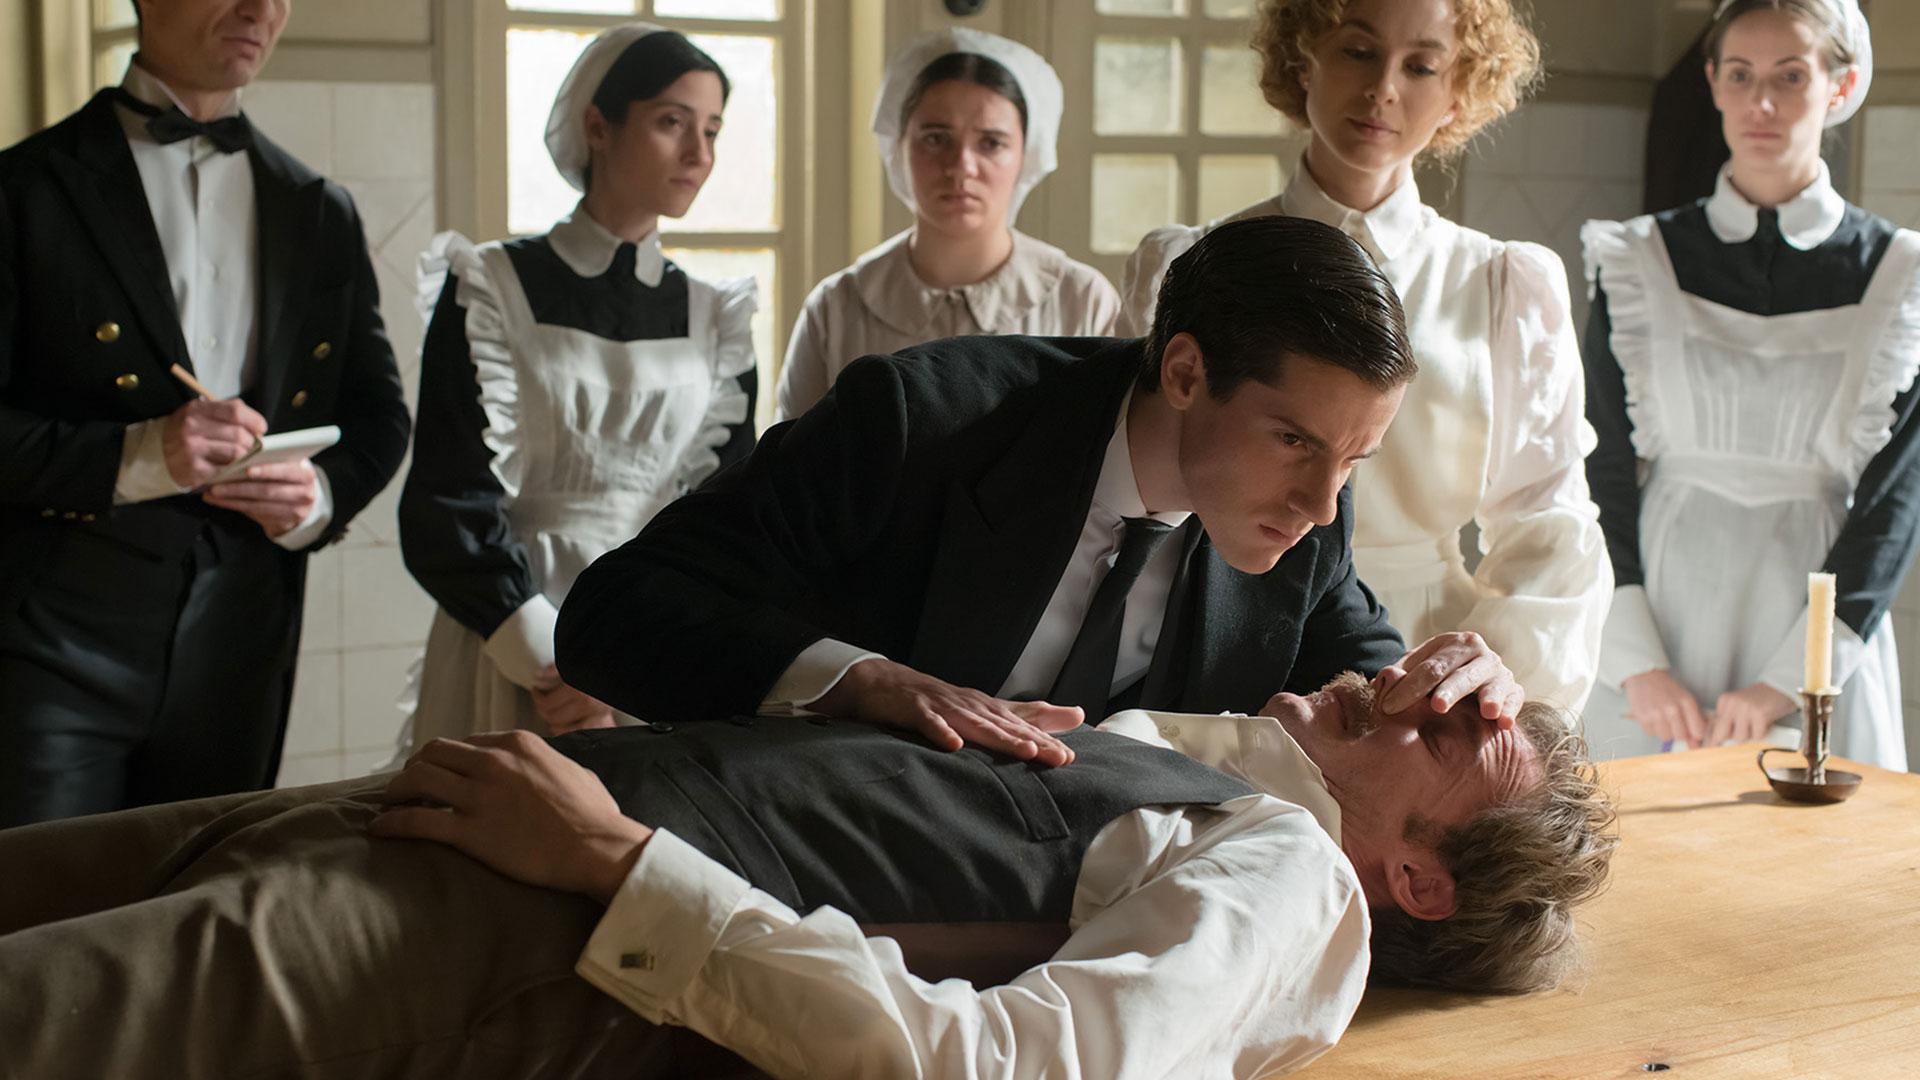 Grand Hotel Staffel  Episode